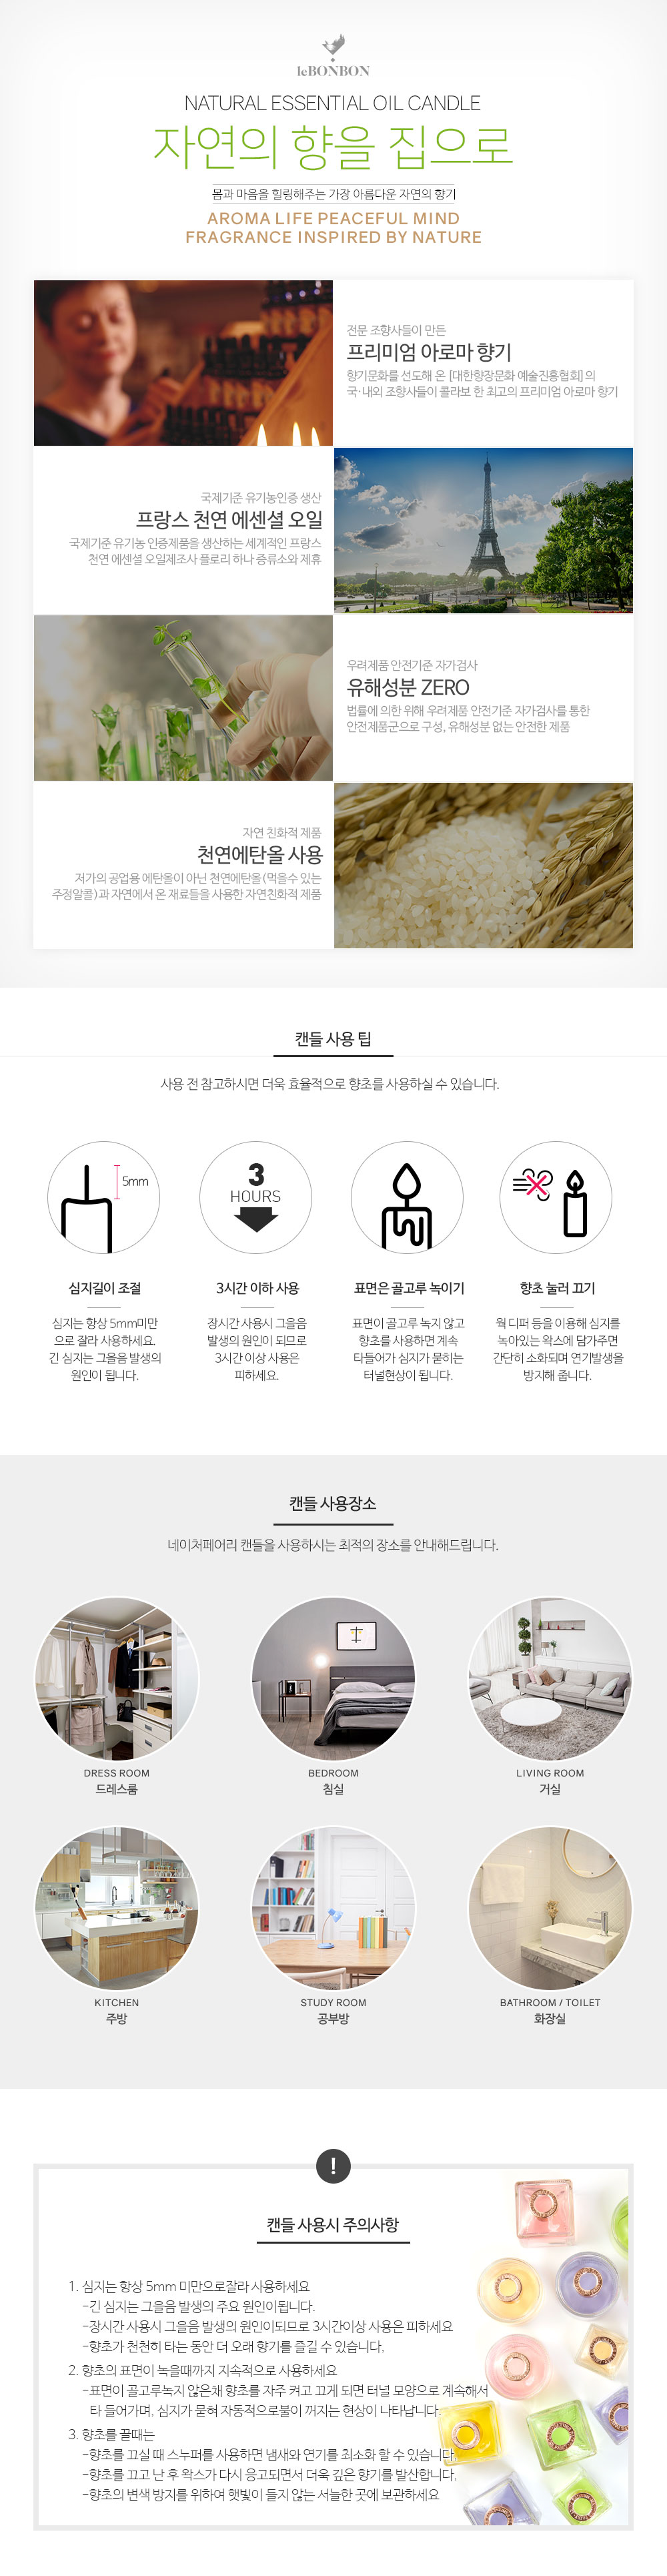 candle_com02.jpg